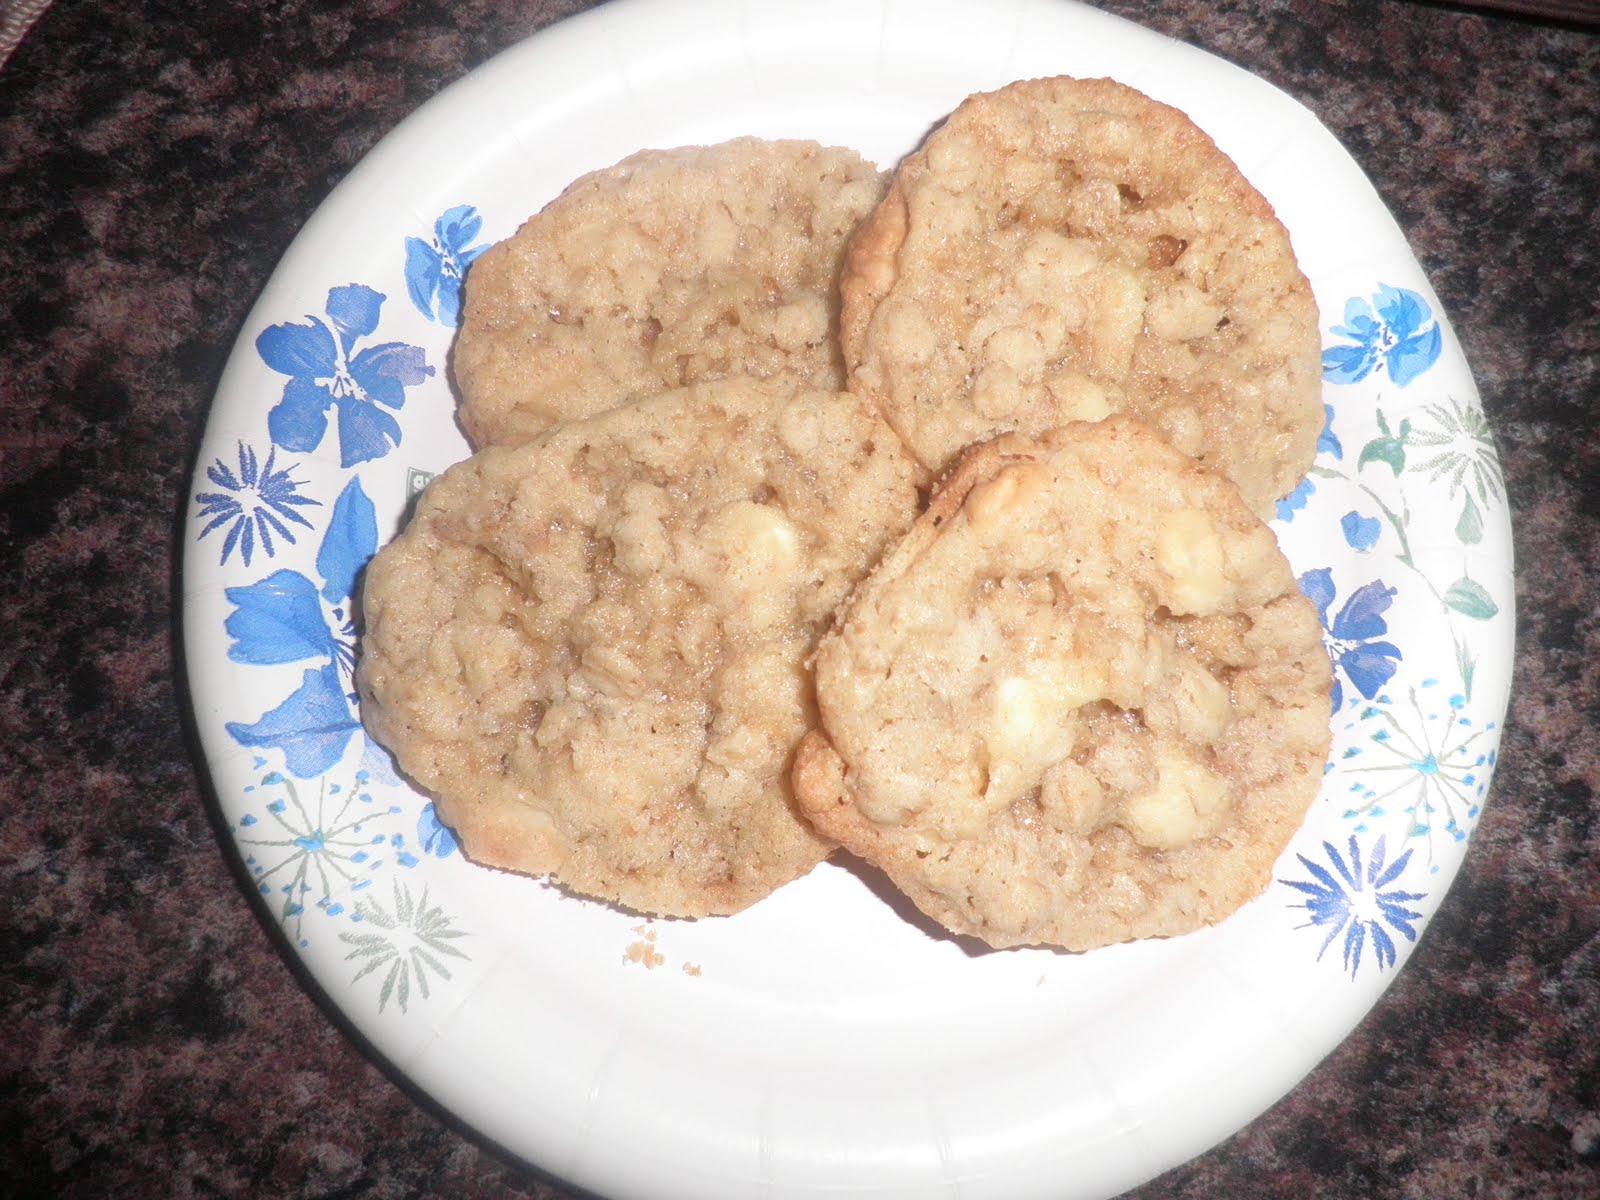 Crispy Salted White Chocolate Oatmeal Cookies